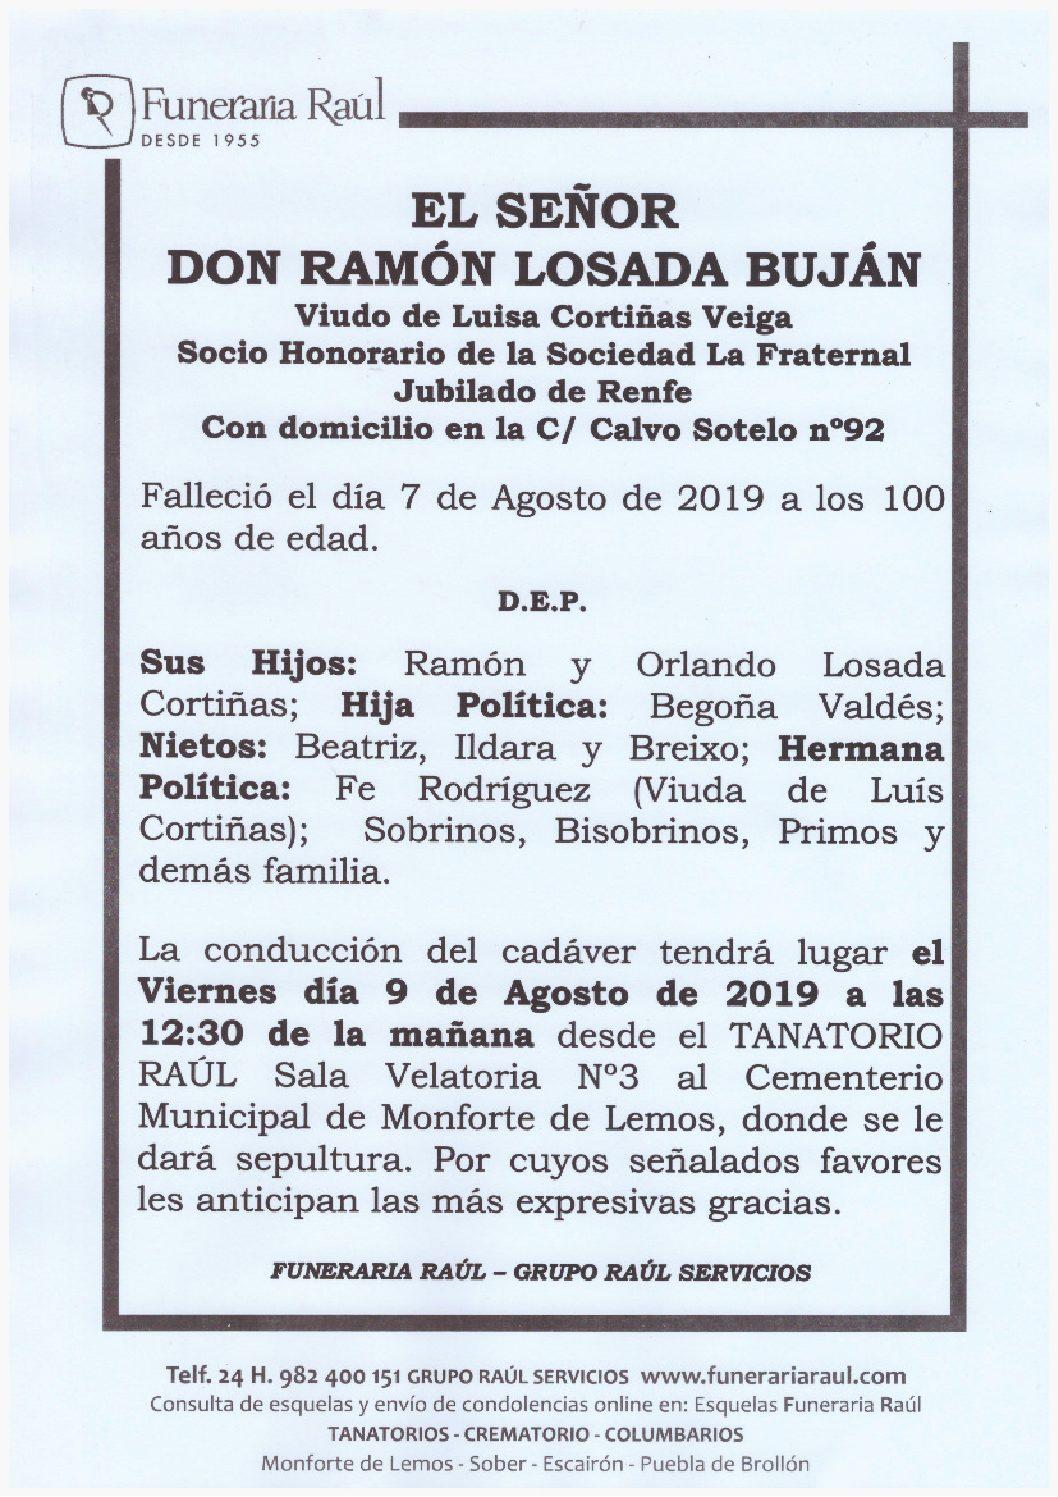 DON RAMON LOSADA BUJAN